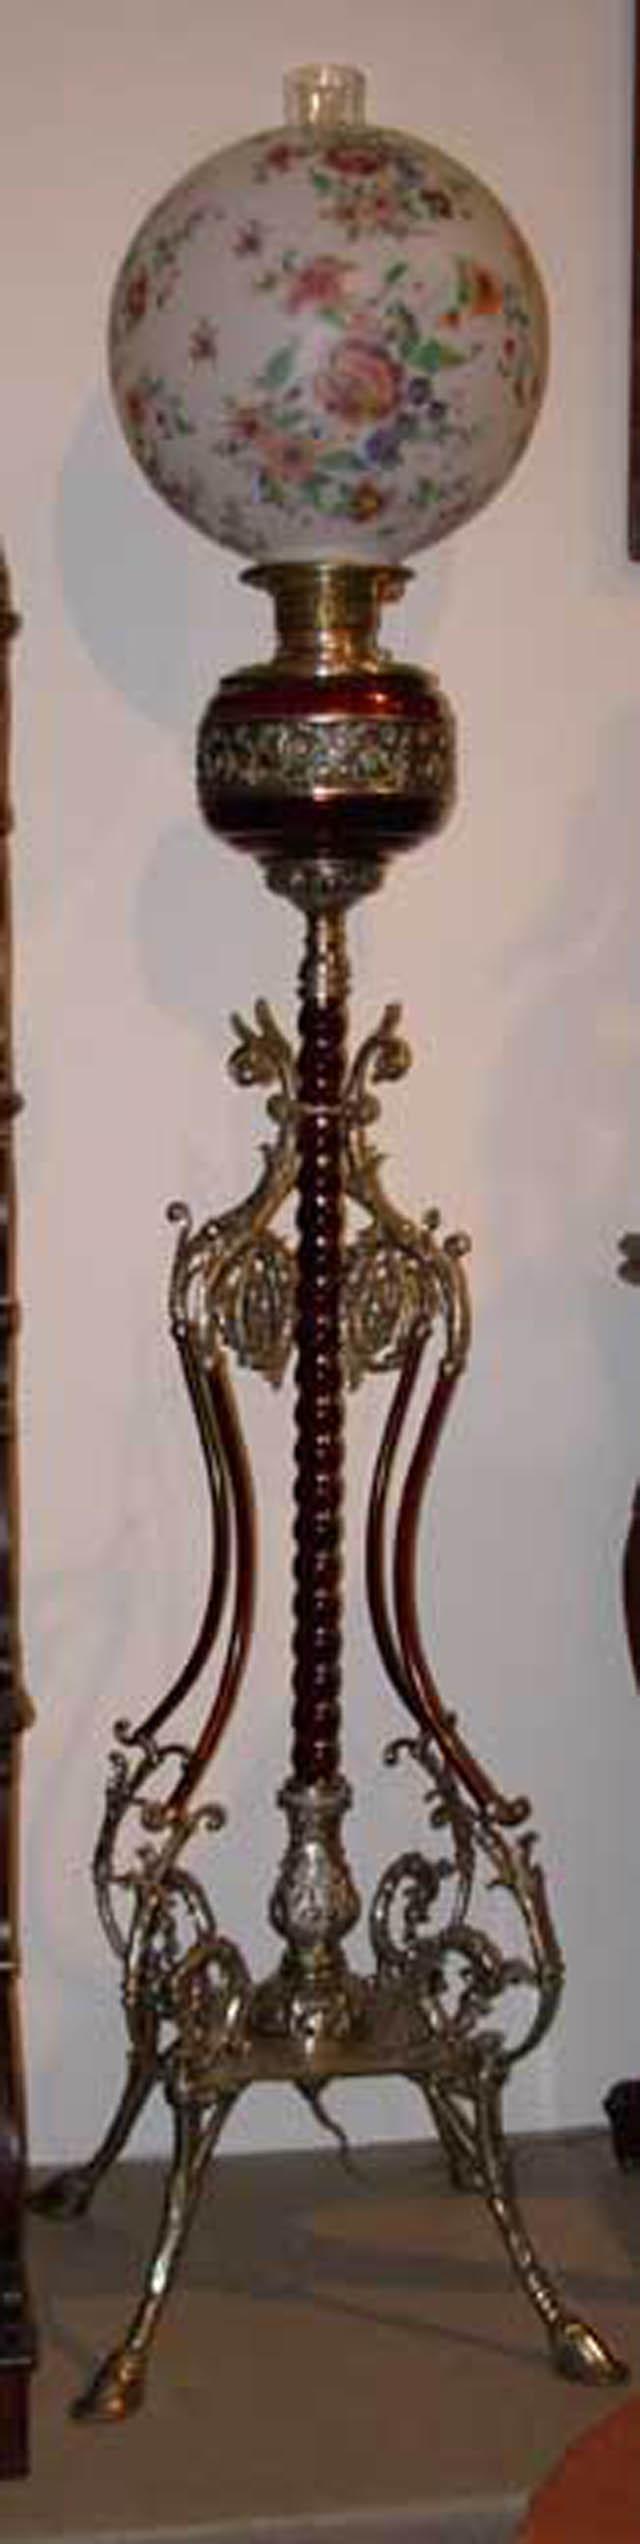 Antique floor lamp stuff i like pinterest antique floor antique floor lamp victorian geotapseo Image collections